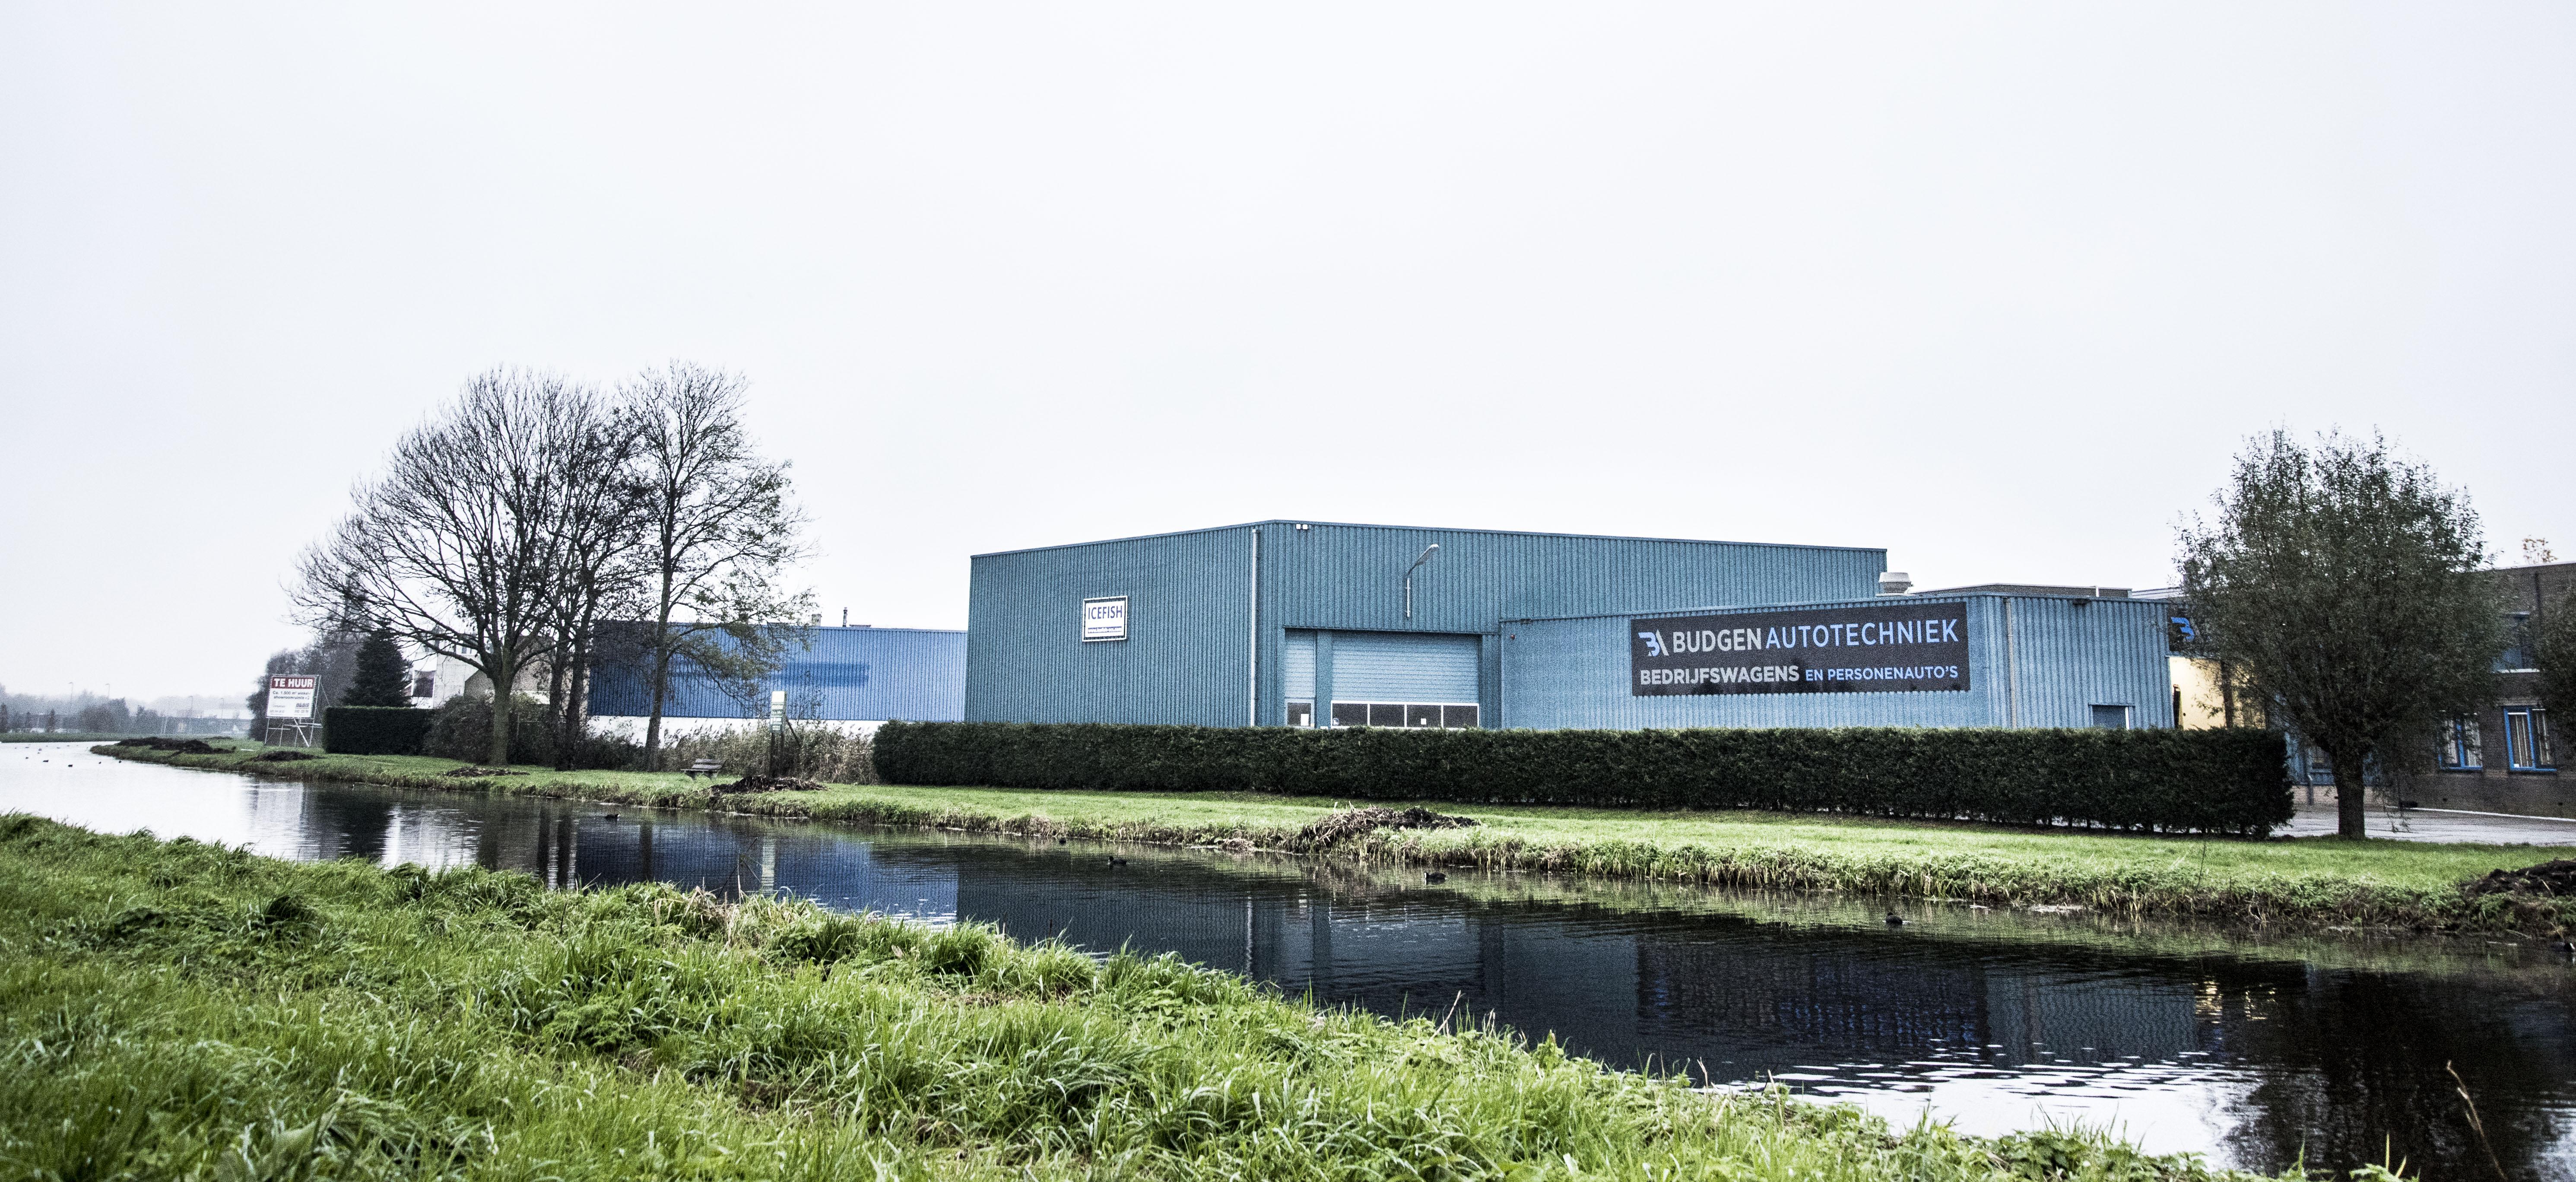 https://www.budgenautotechniek.nl-garage in Waddinxveen